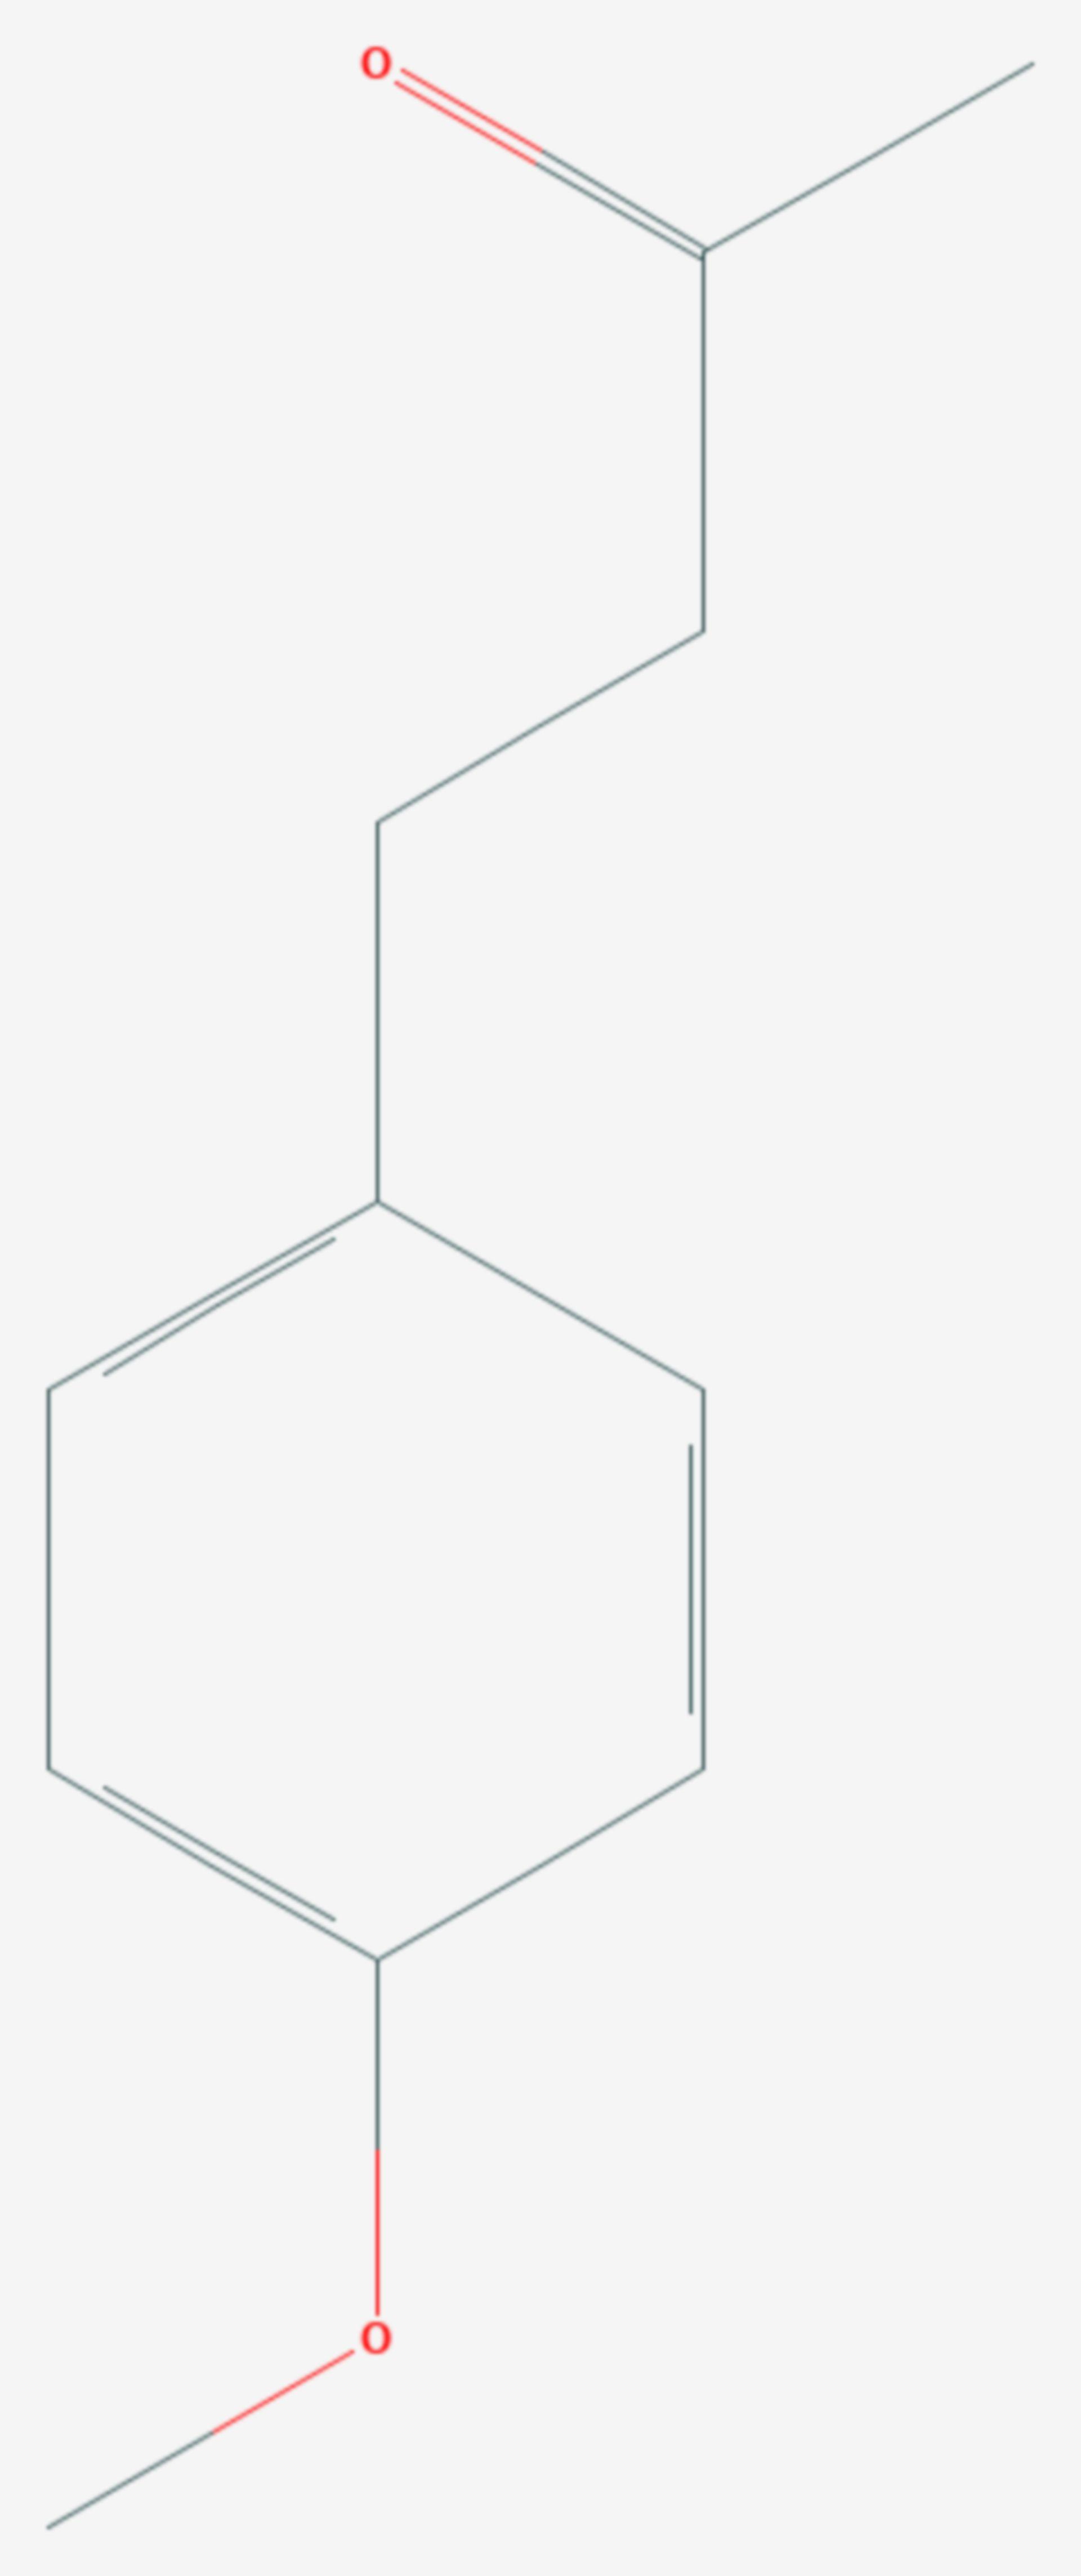 Anisylaceton (Strukturformel)